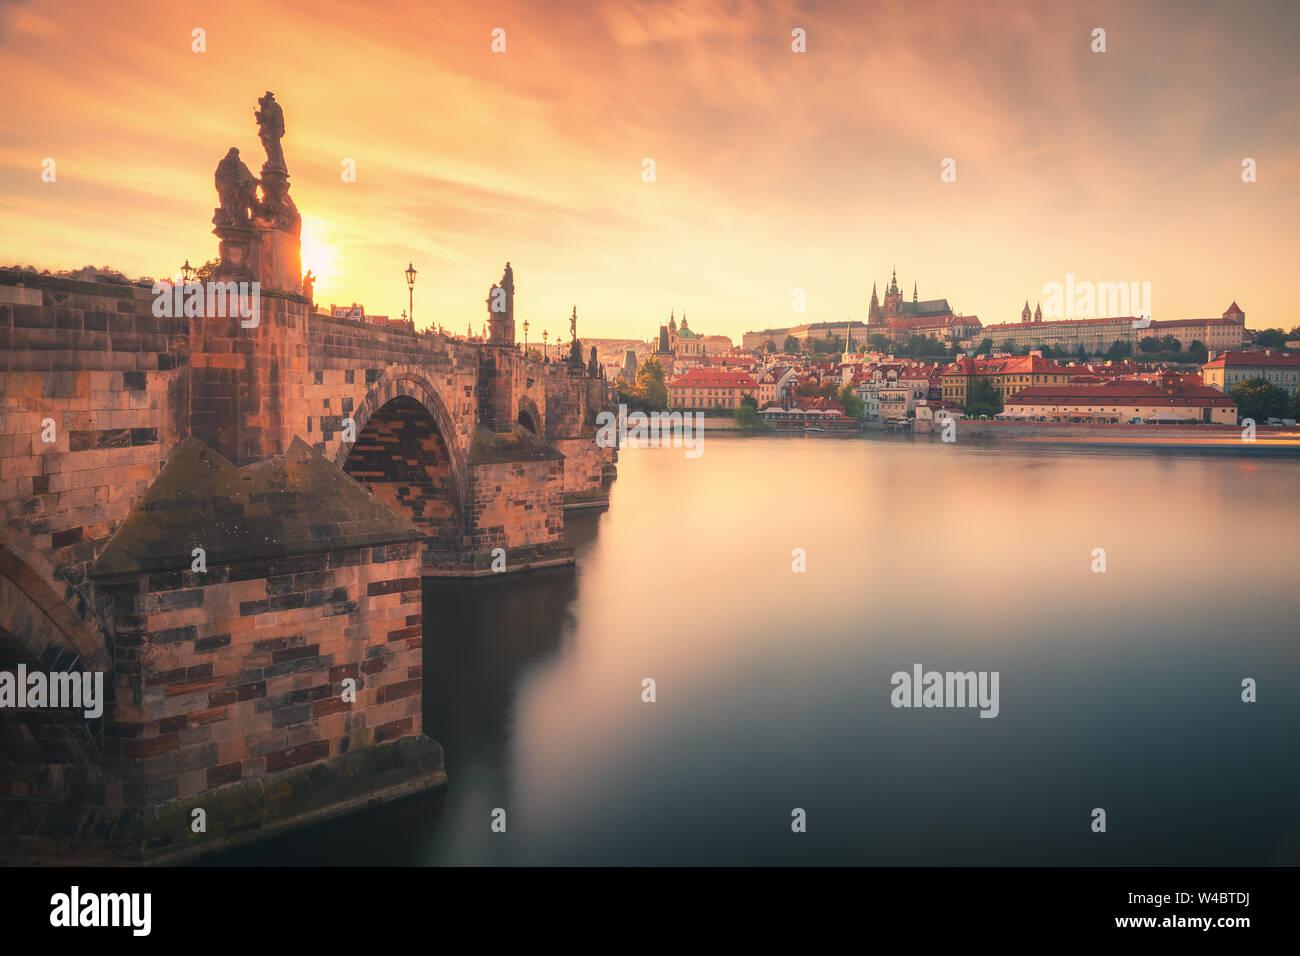 Sunset view over Charles Bridge (Karlov Most), Vltava river and Prague Castle in summer in Prague, capital of Czech Republic Stock Photo